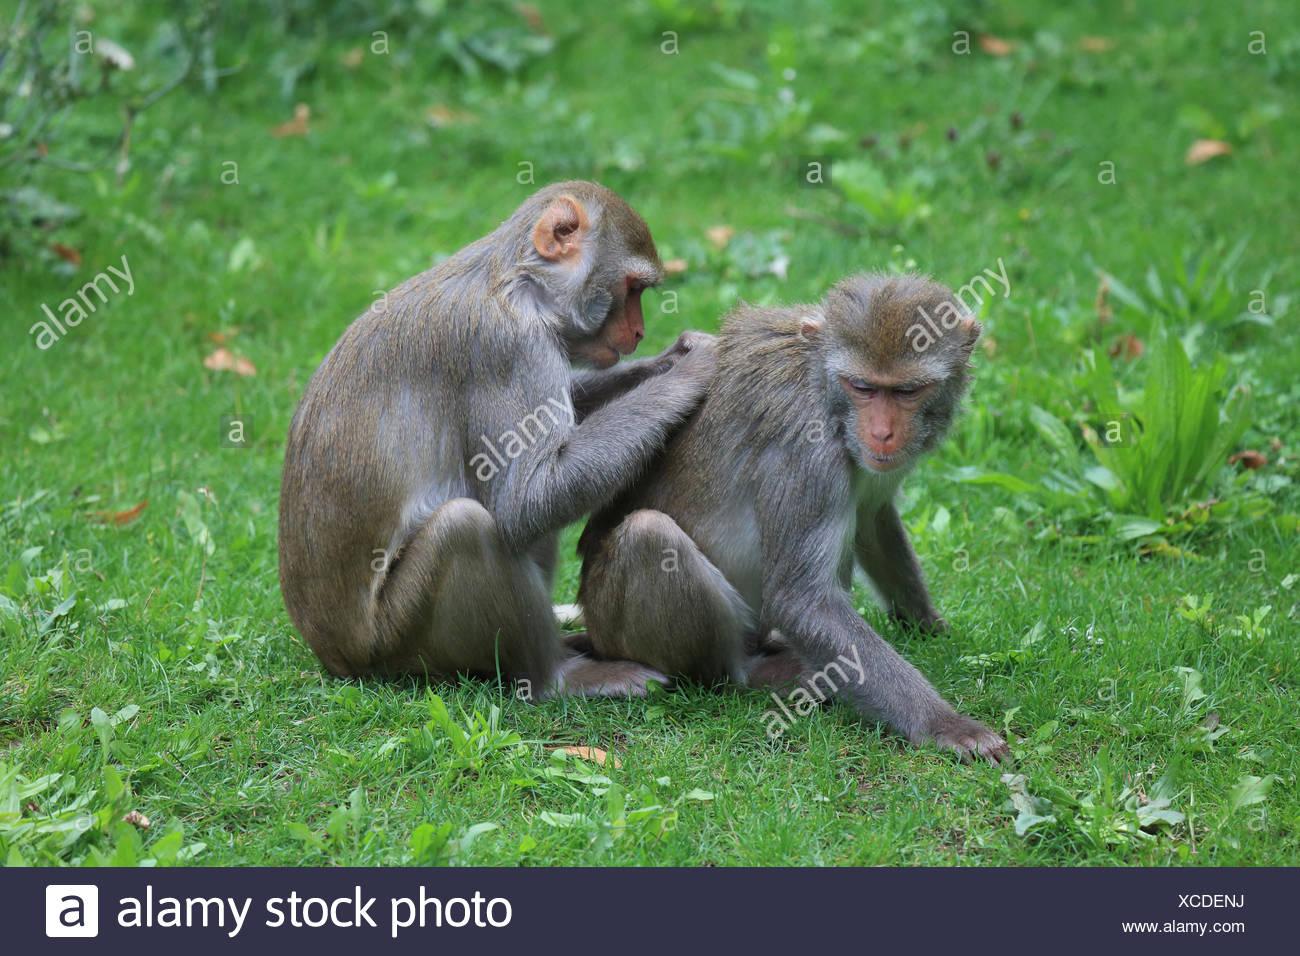 Rhesus macaques delousing, Macaca mulatta - Stock Image